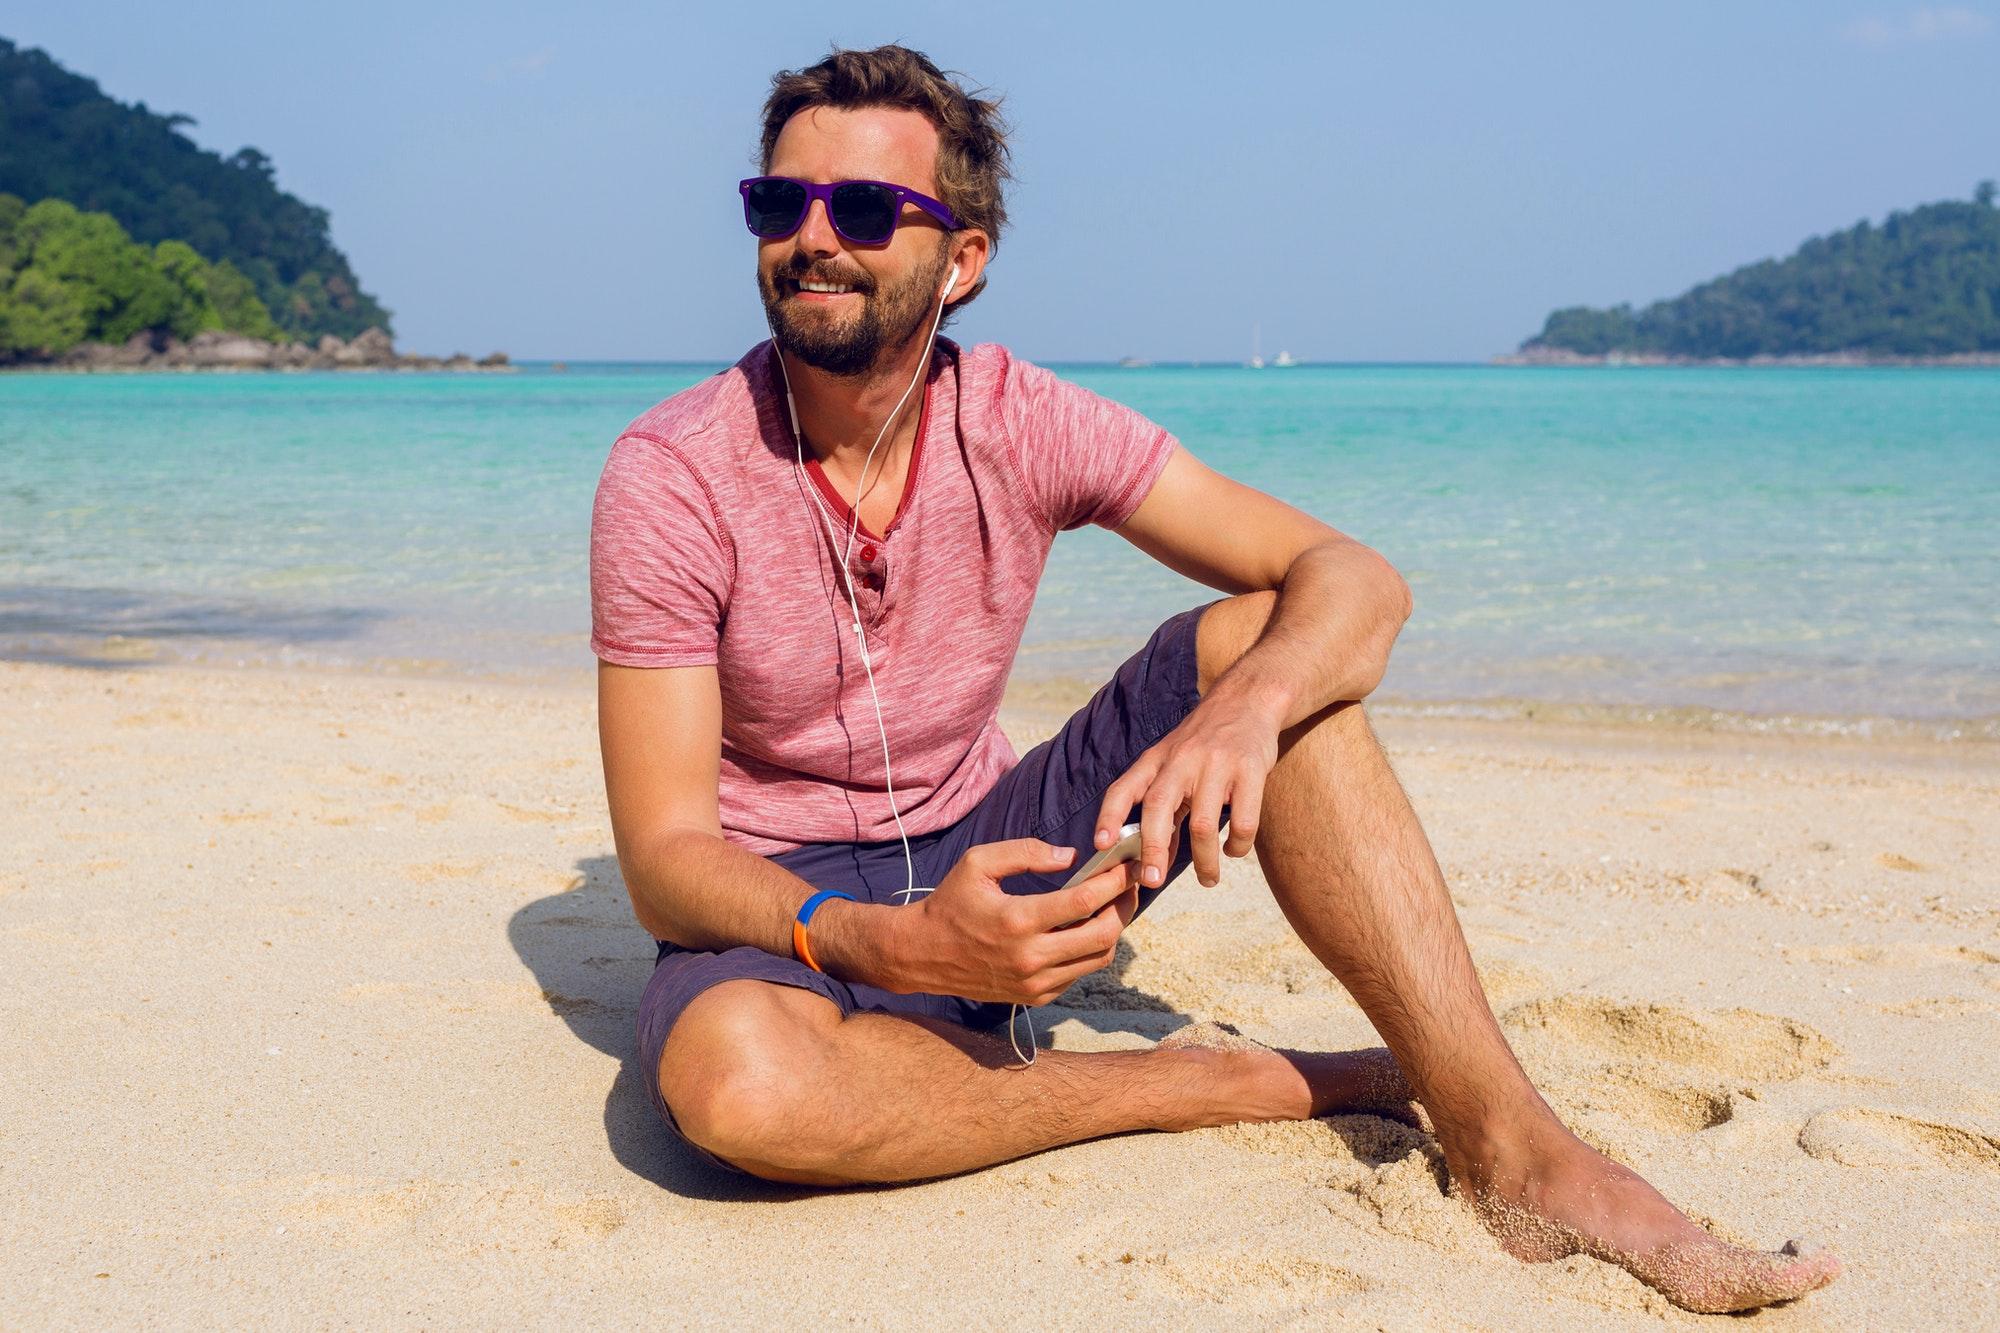 Attractive man man in stylish sunglasses with beard